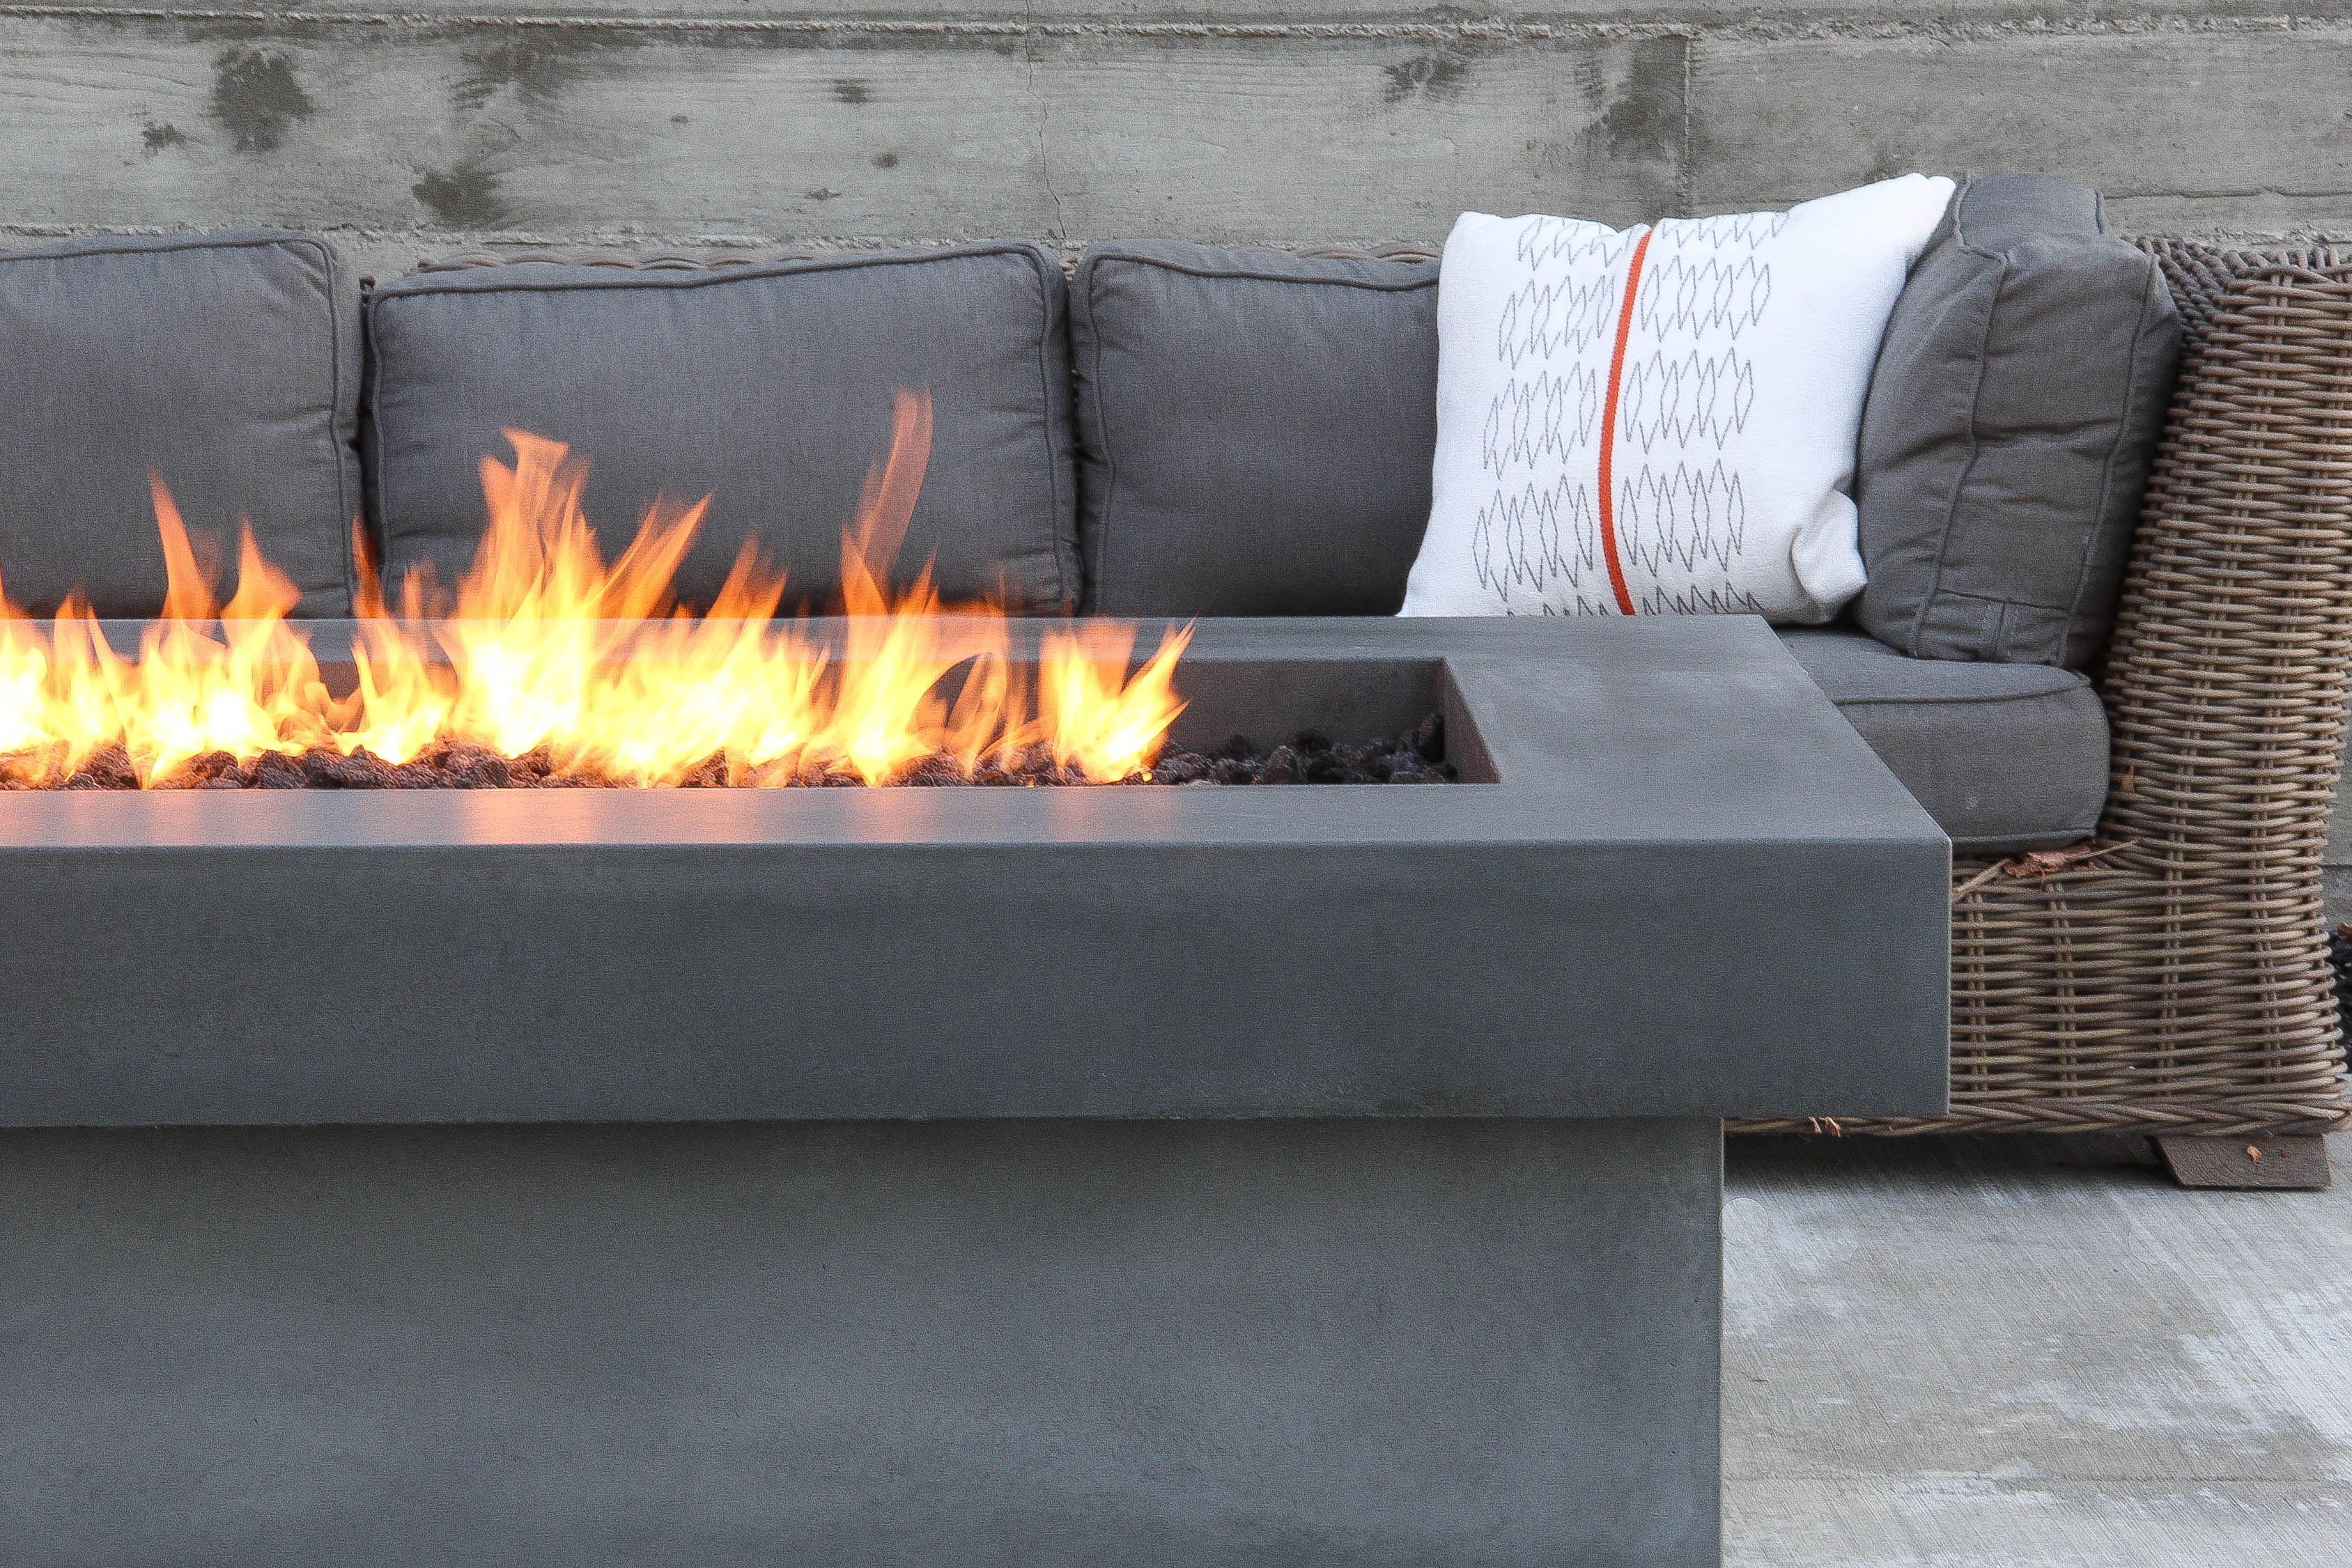 Olson Fire Table Concrete Wave Design Concrete Countertops Fireplaces Patios Furniture Fire Table Concrete Fire Pits Fire Pit